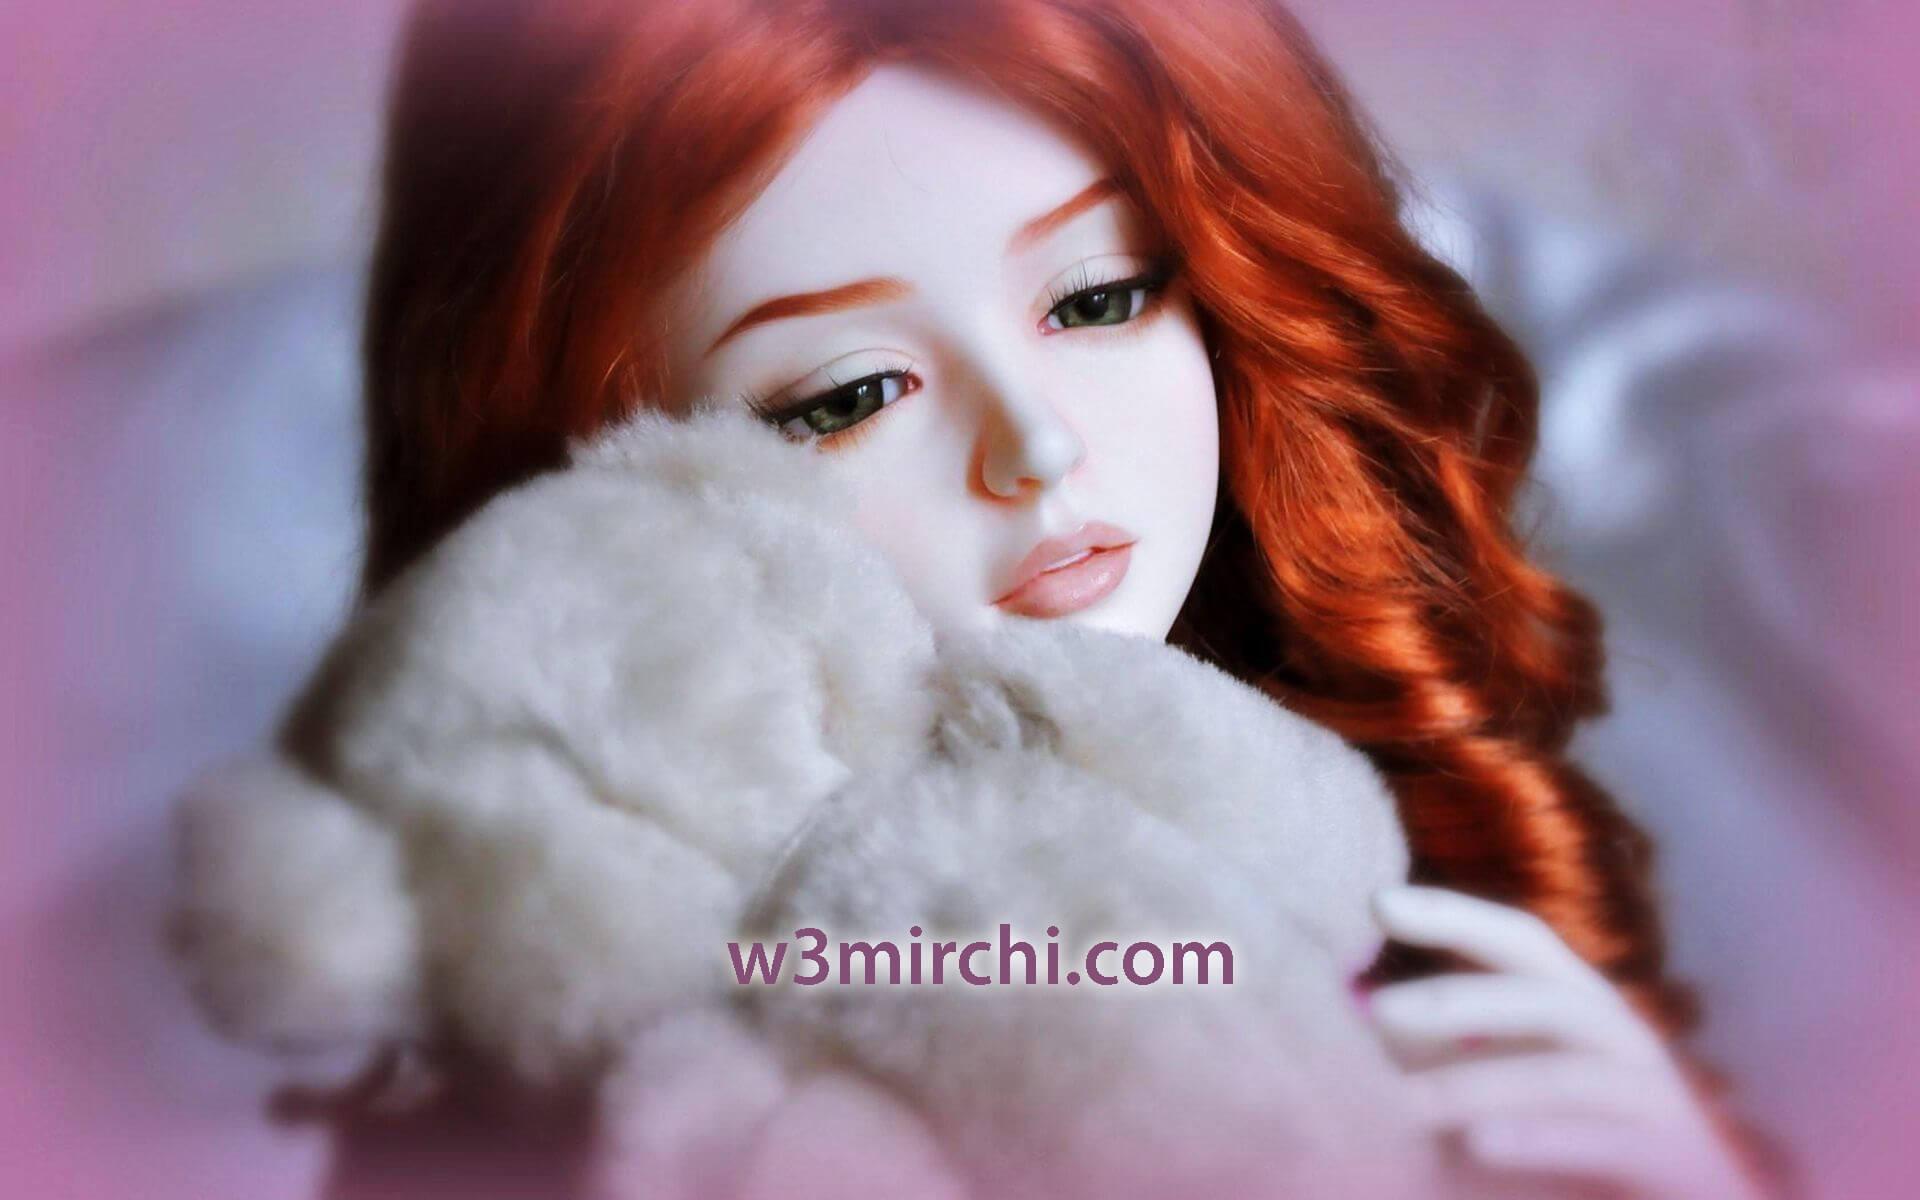 Wallpaper Cute Profile Facebook Whatsapp Dp Barbie Doll Pic Girls Dp